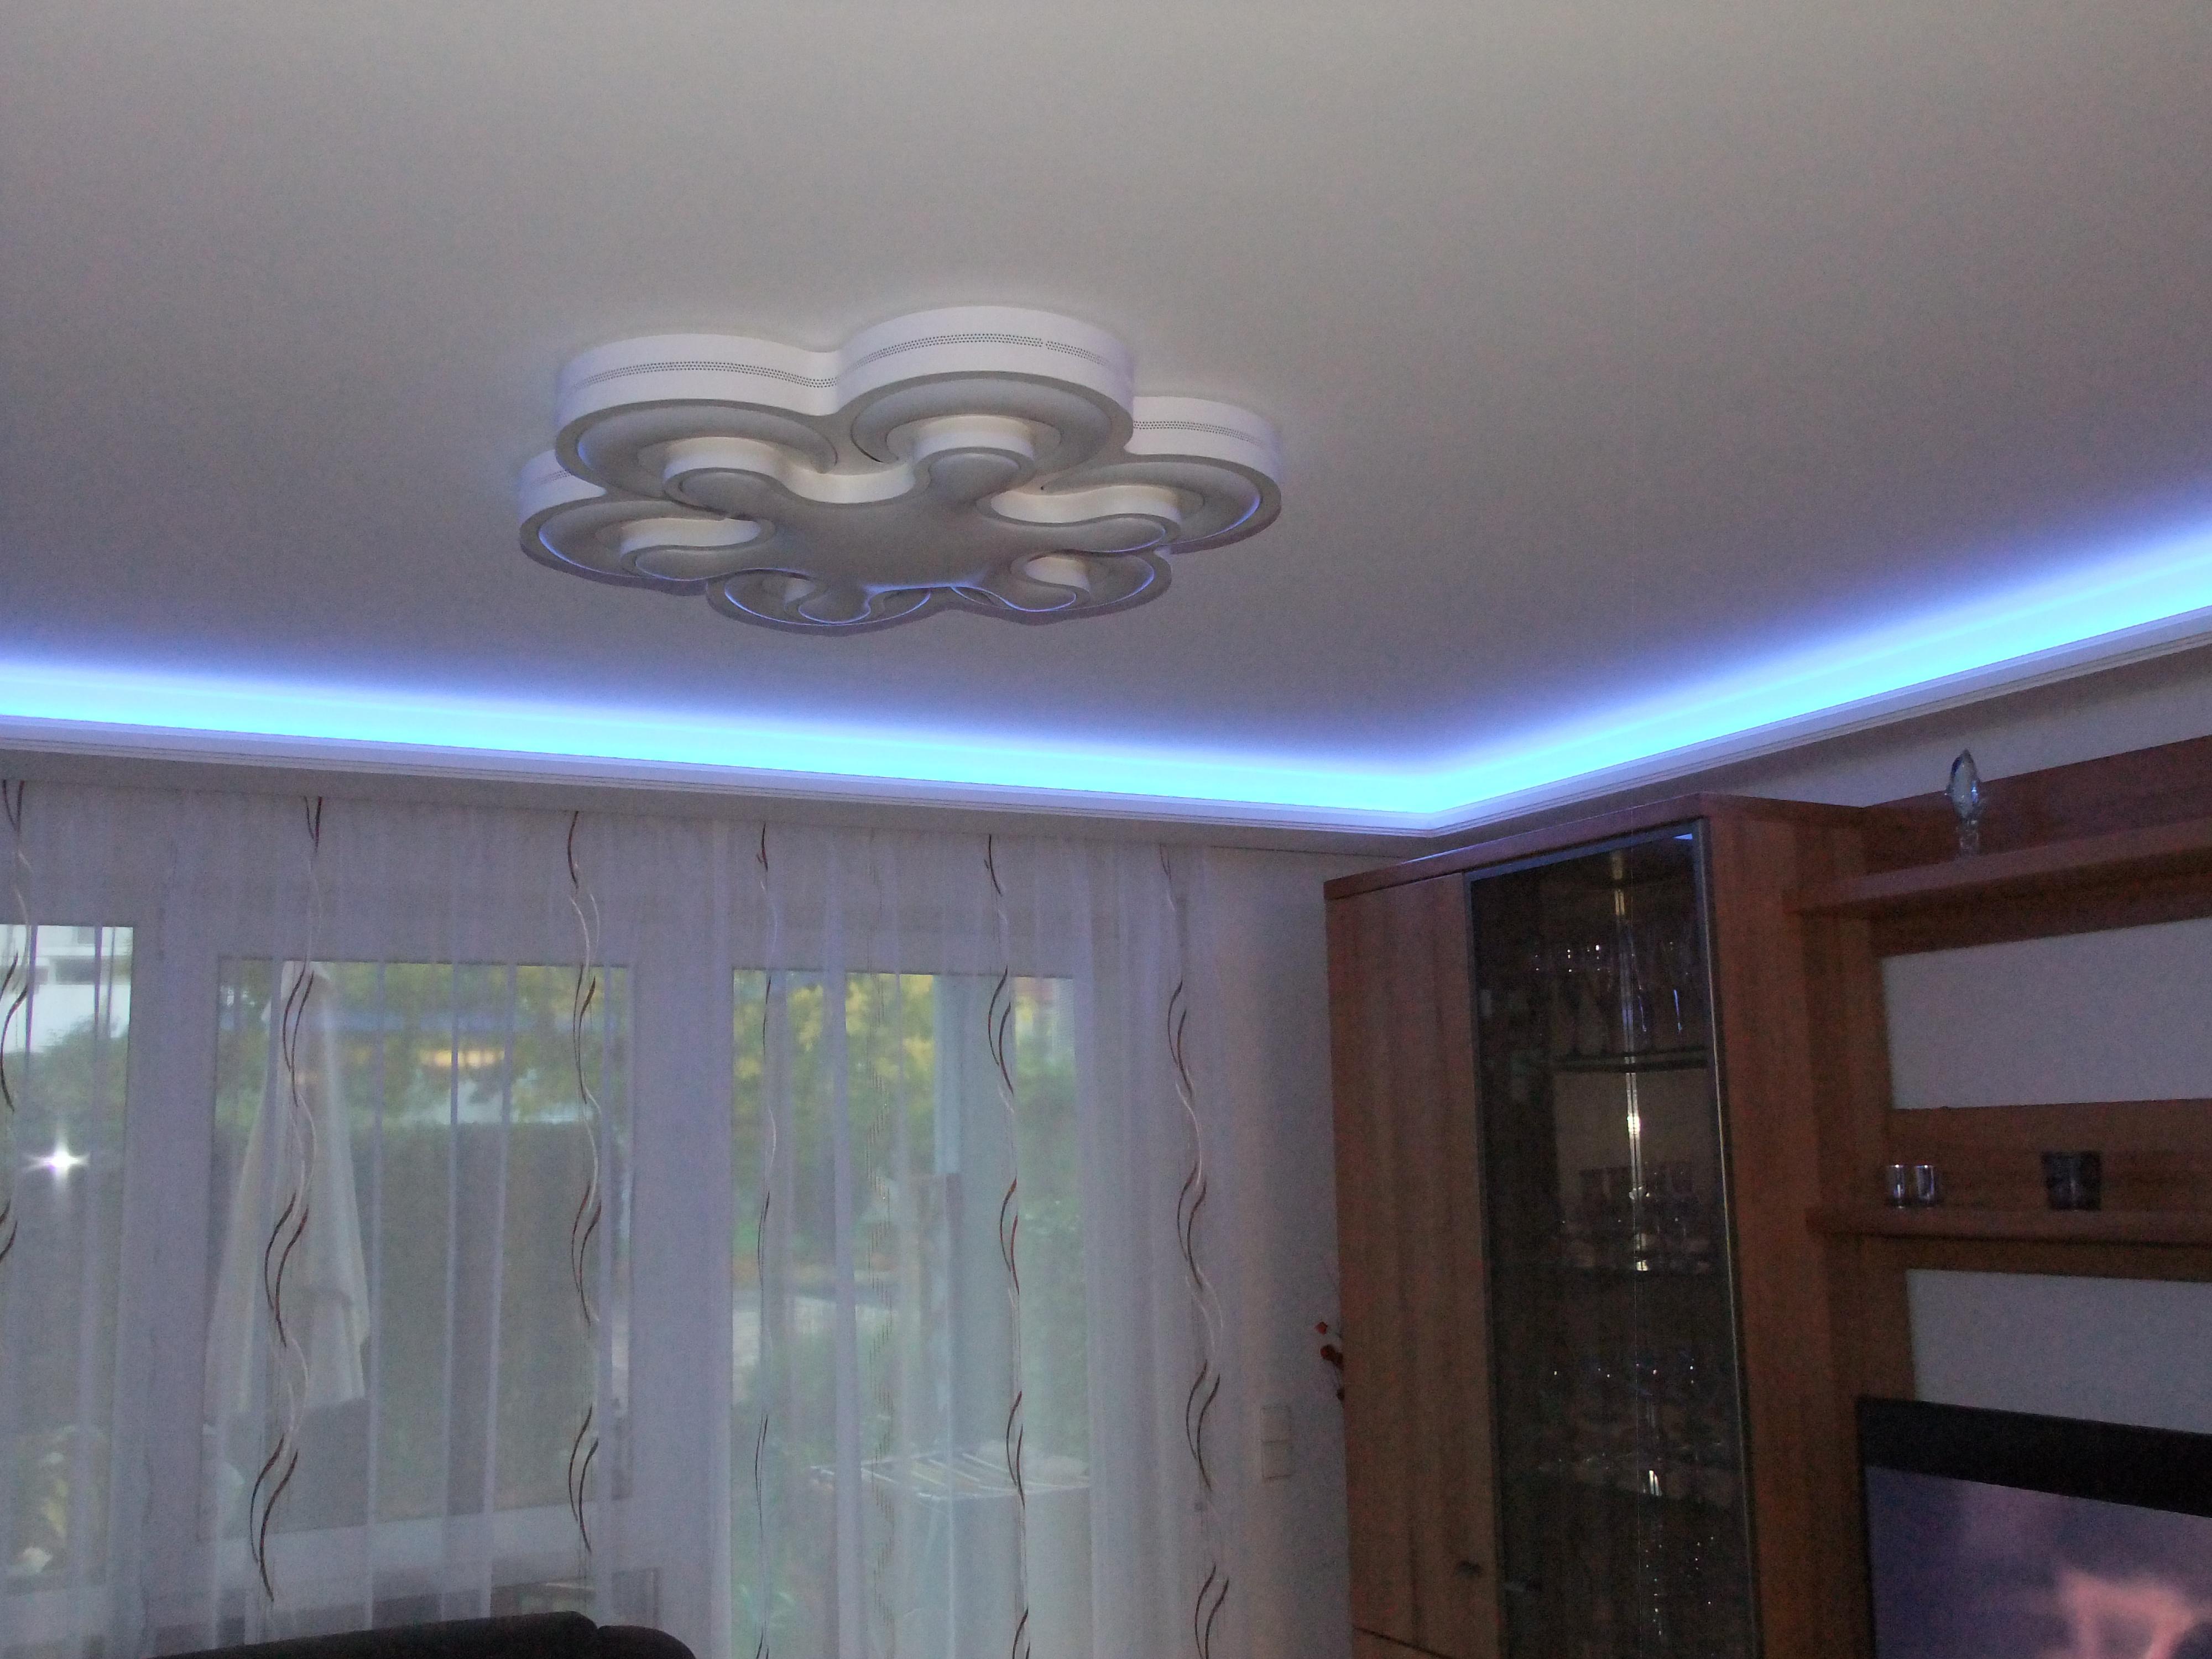 1 m led indirekte beleuchtung lichtprofile stuckleisten. Black Bedroom Furniture Sets. Home Design Ideas